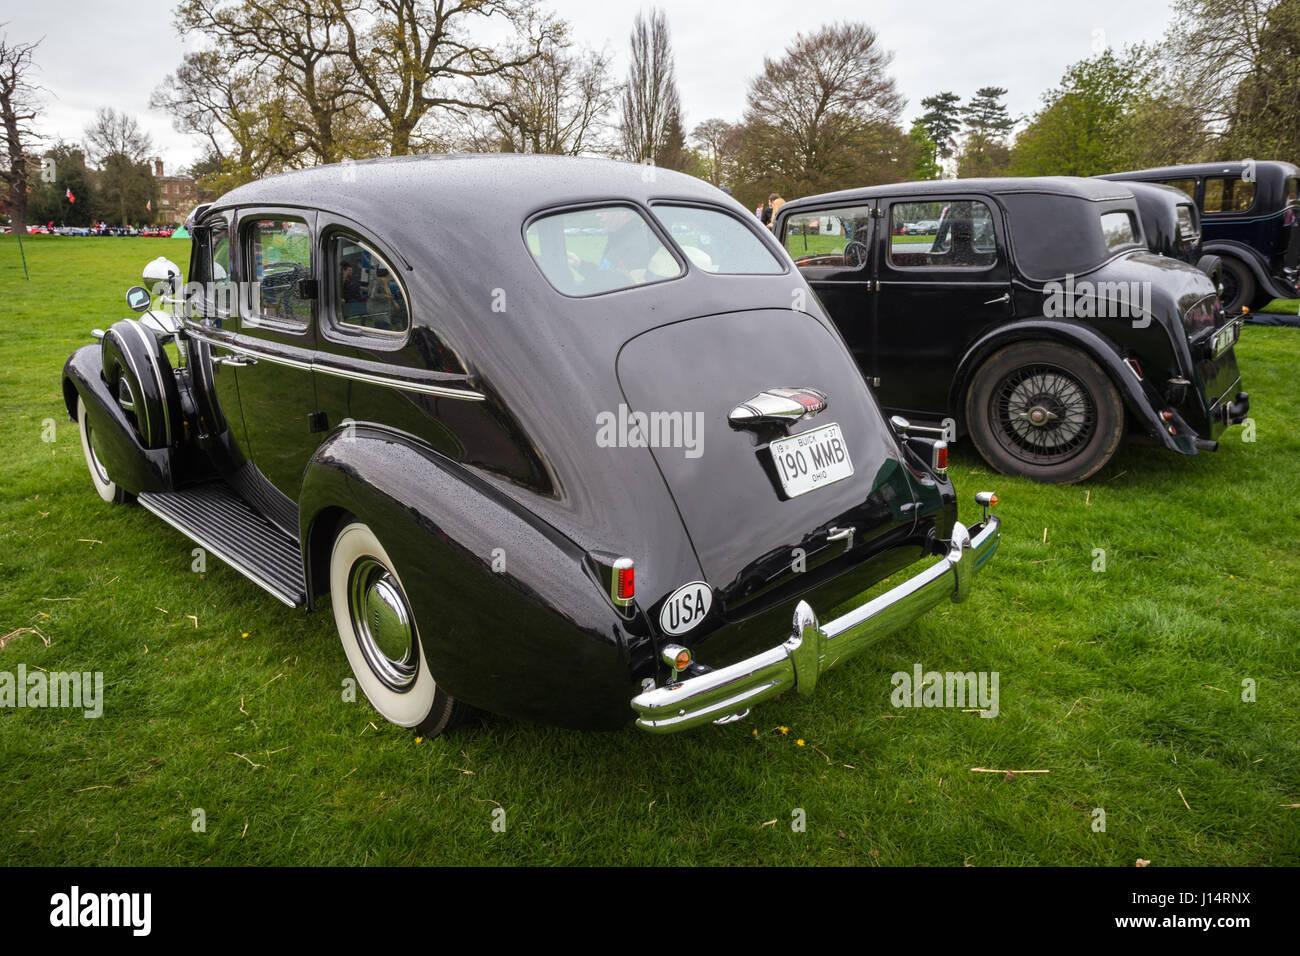 Classic cars vehicle at show UK Stock Photo, Royalty Free Image ...